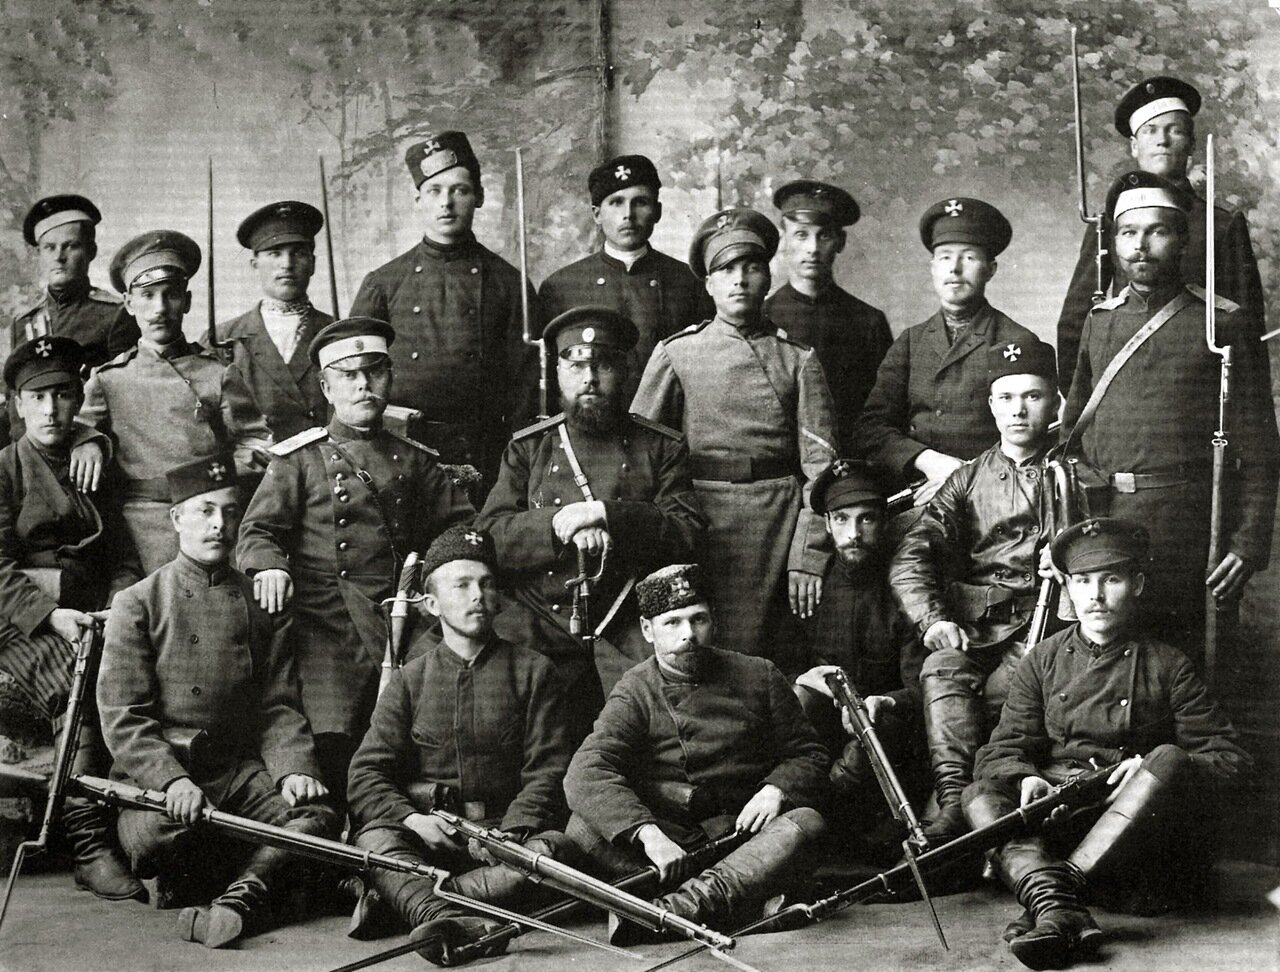 Ратники-ополченцы. 1890-е годы.